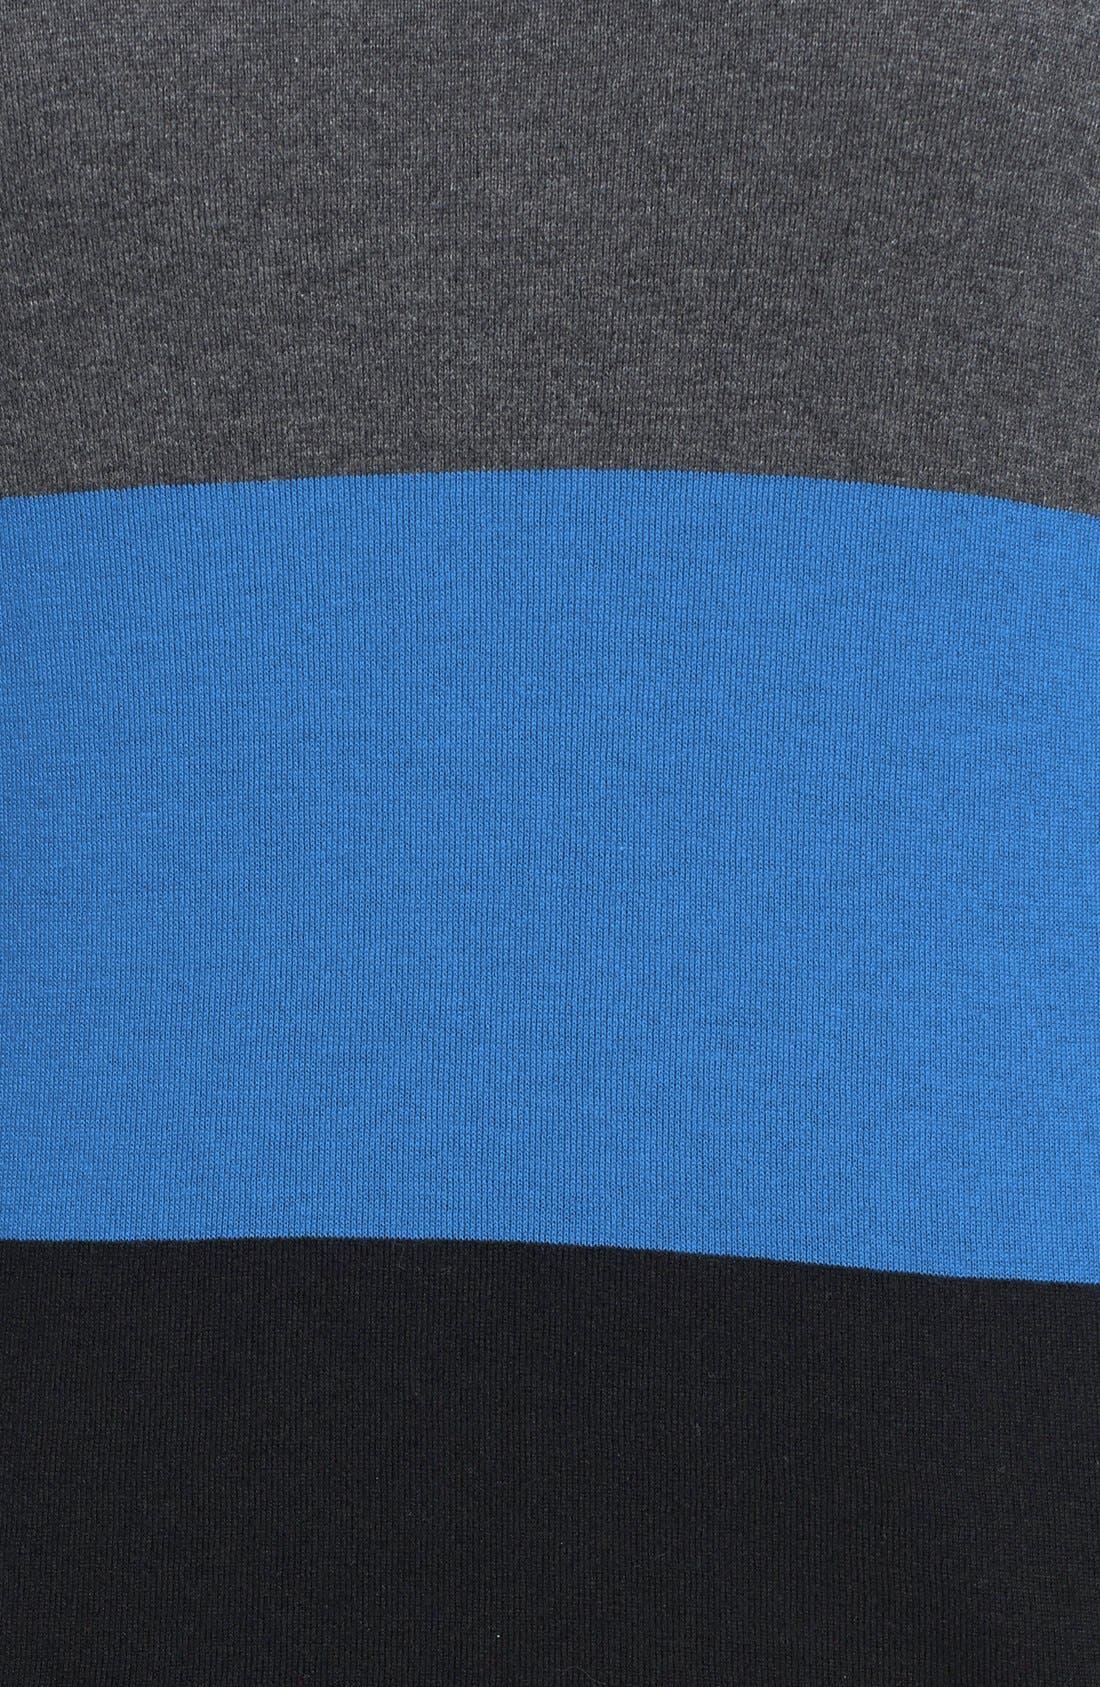 Alternate Image 3  - Vince Camuto Colorblock Boatneck Sweater (Plus Size)